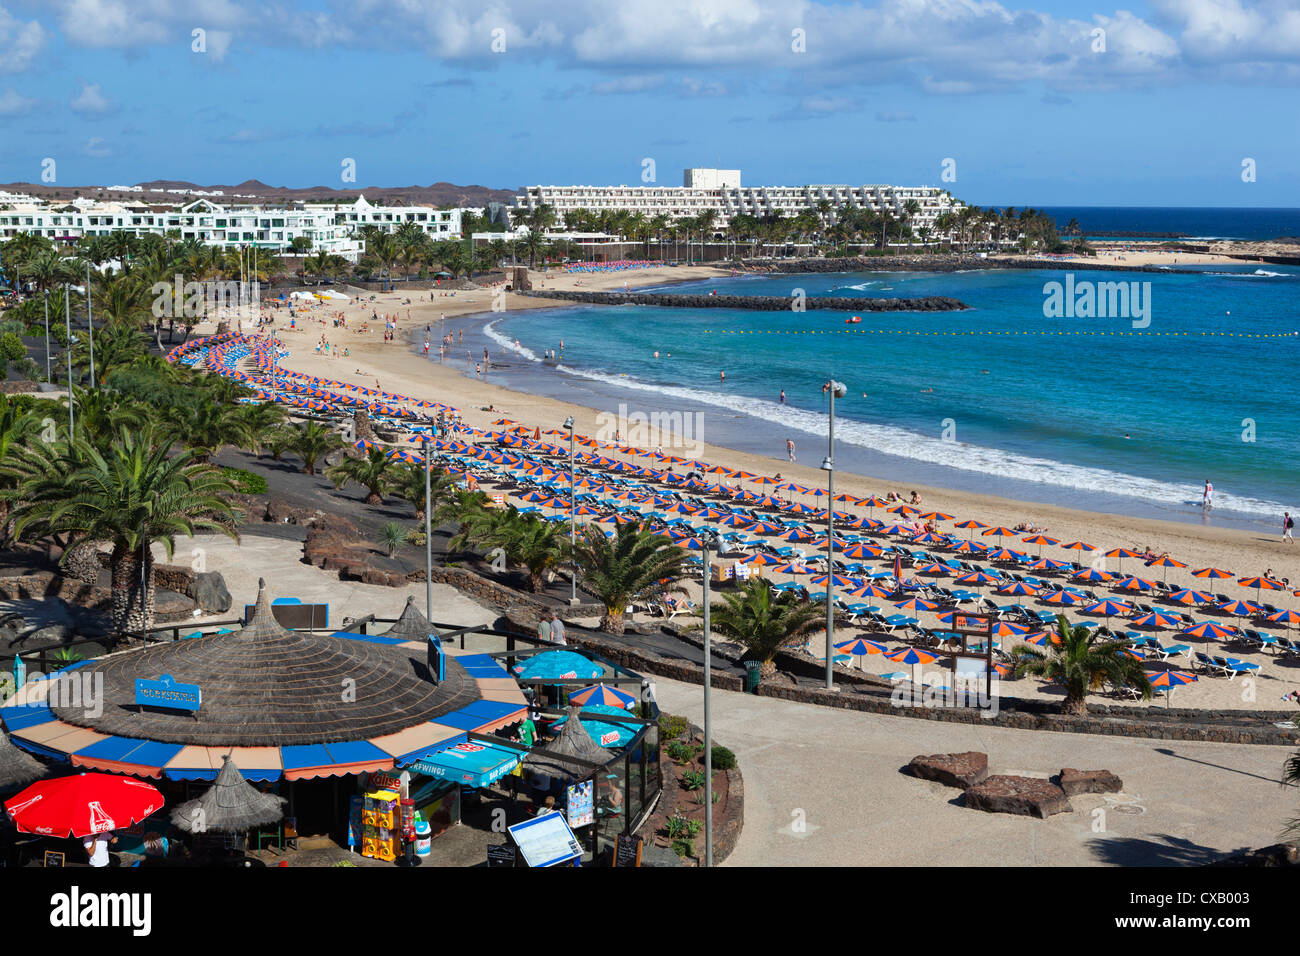 Playa de Las Cucharas, Costa Teguise, Lanzarote, Kanarische Inseln, Spanien, Atlantik, Europa Stockbild